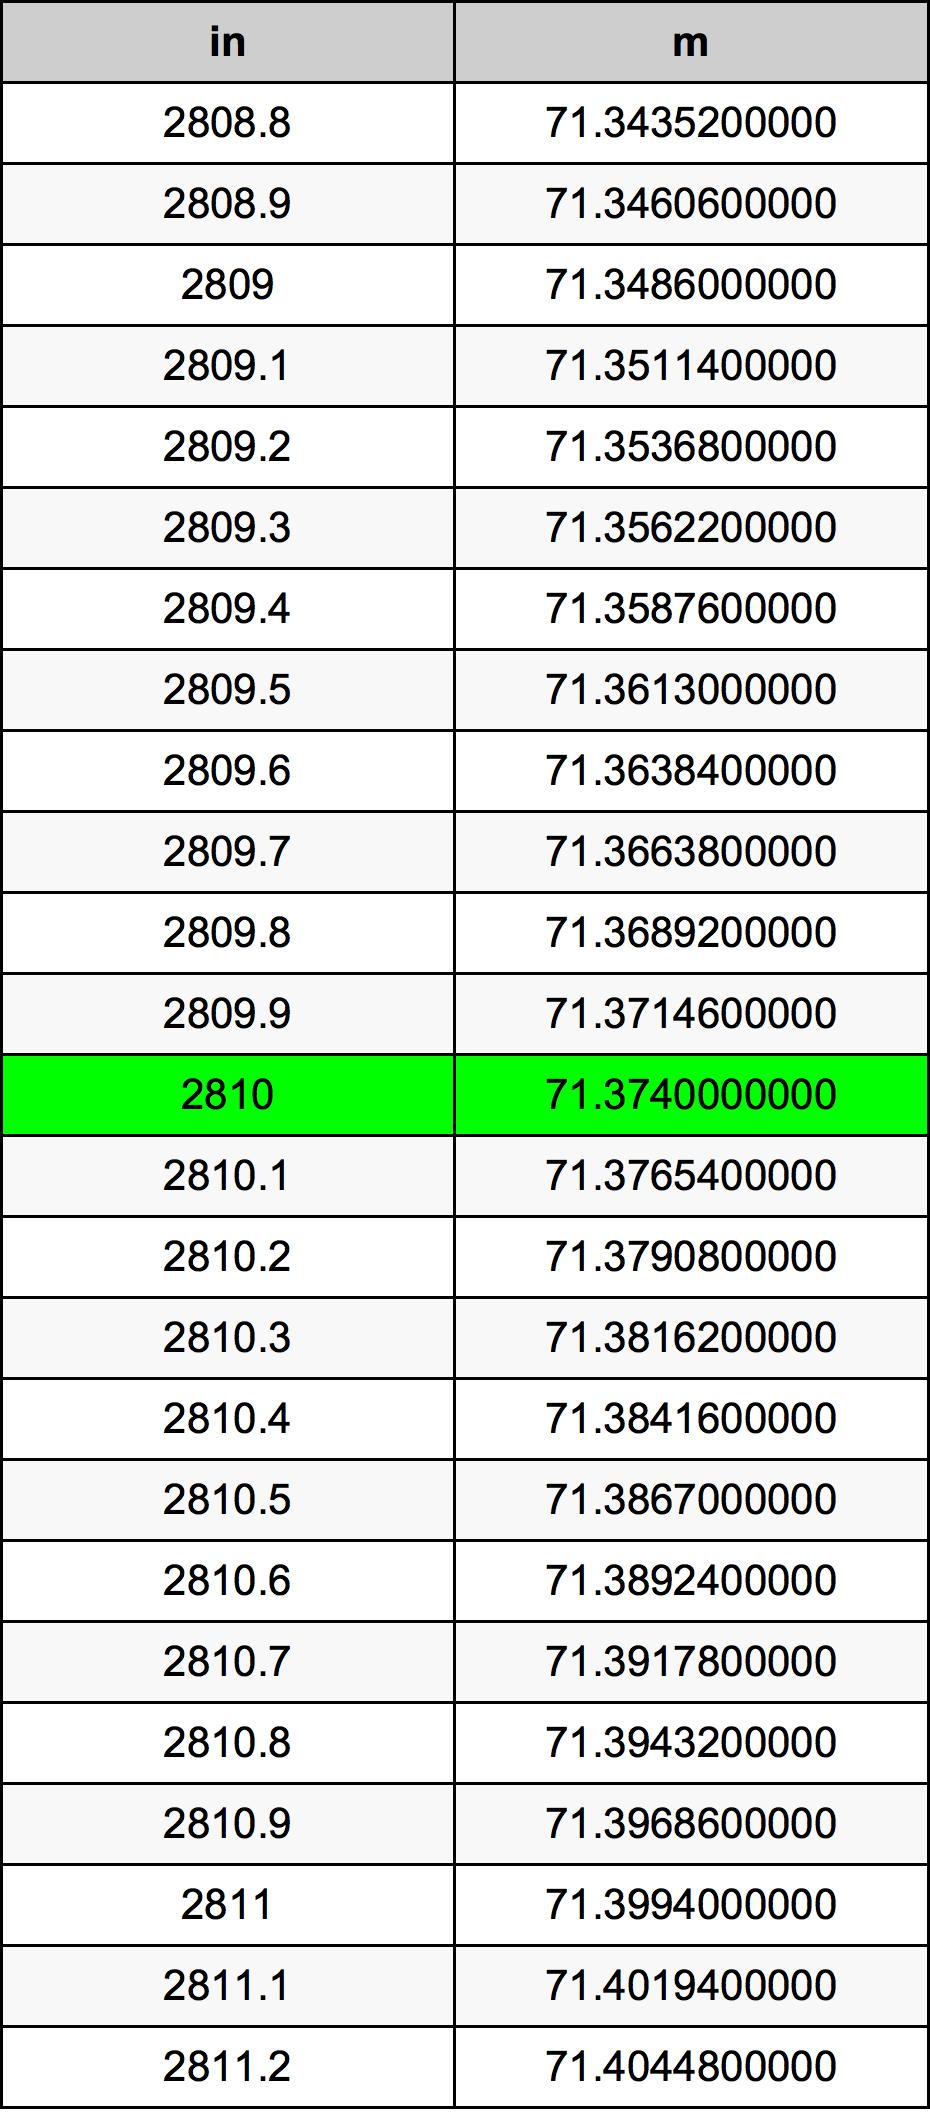 2810 इंच रूपांतरण सारणी